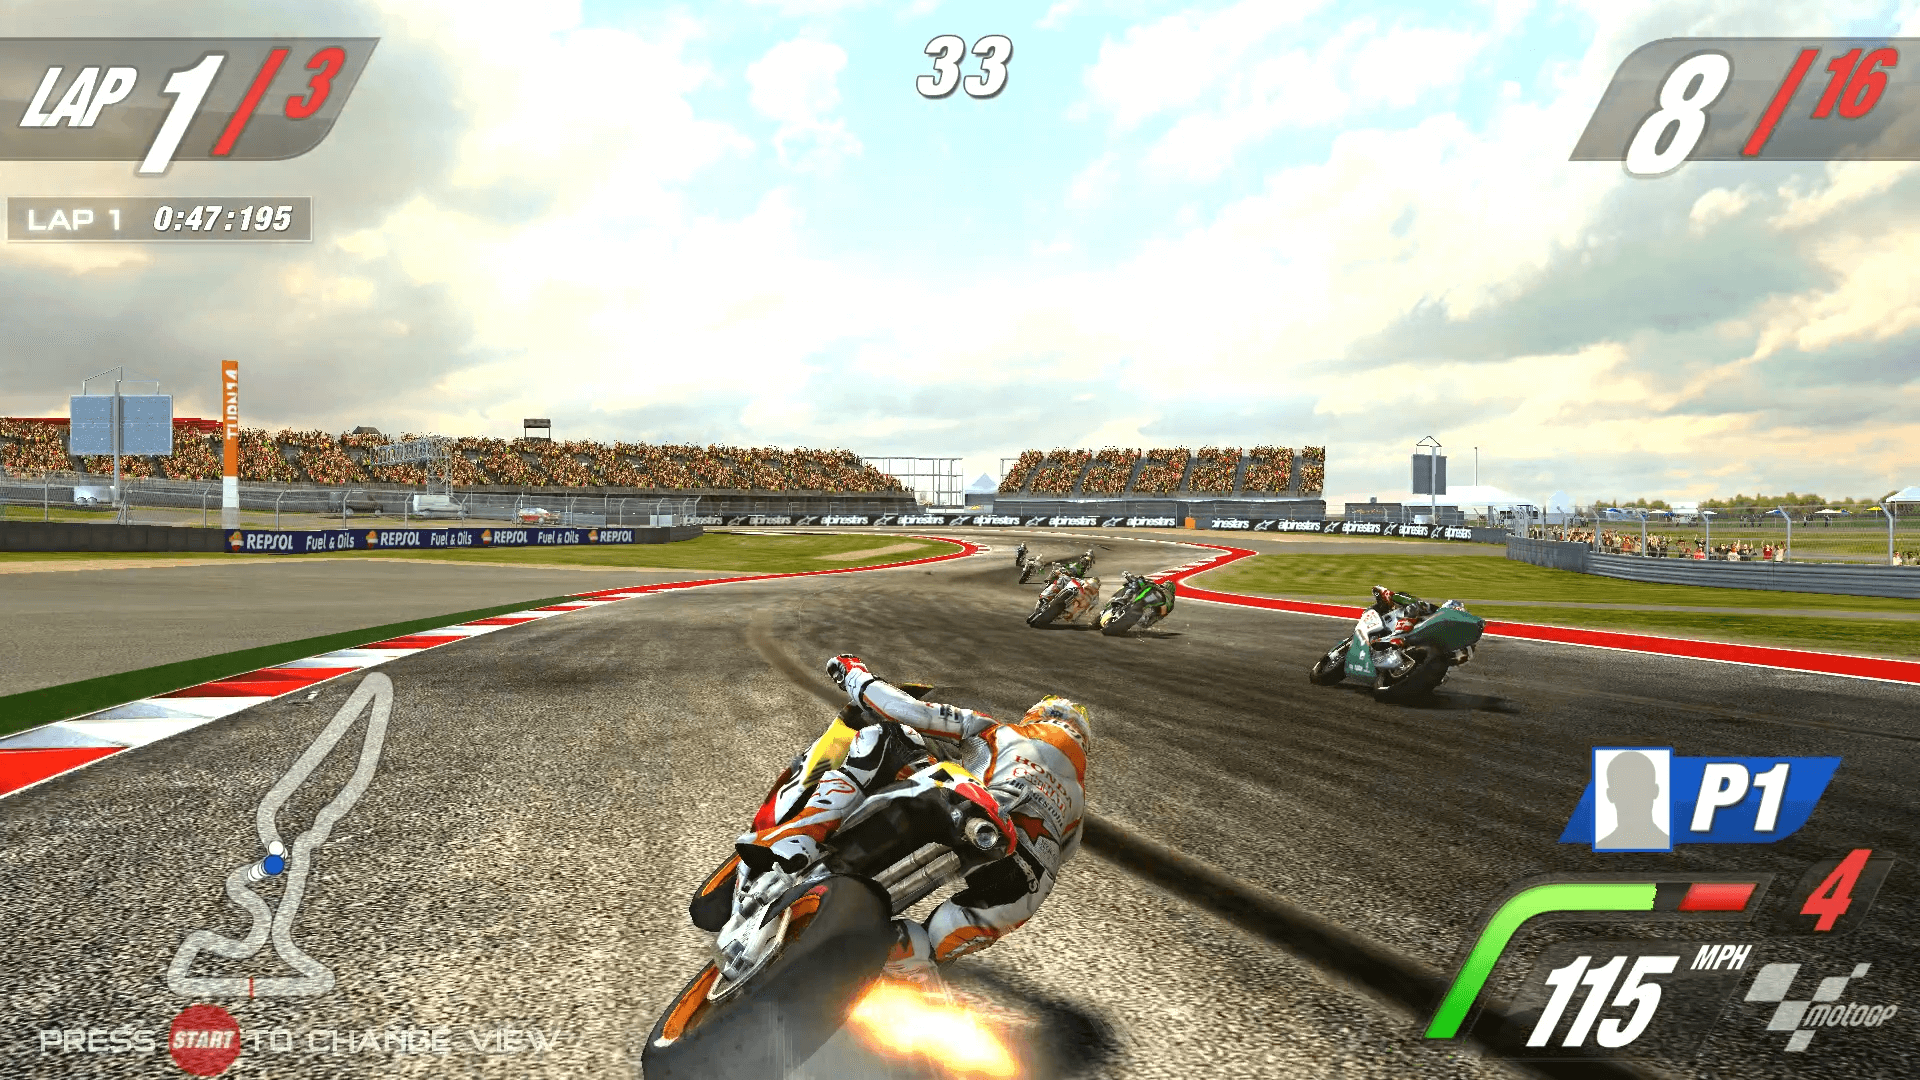 MOTO GP Image - Click To Enlarge